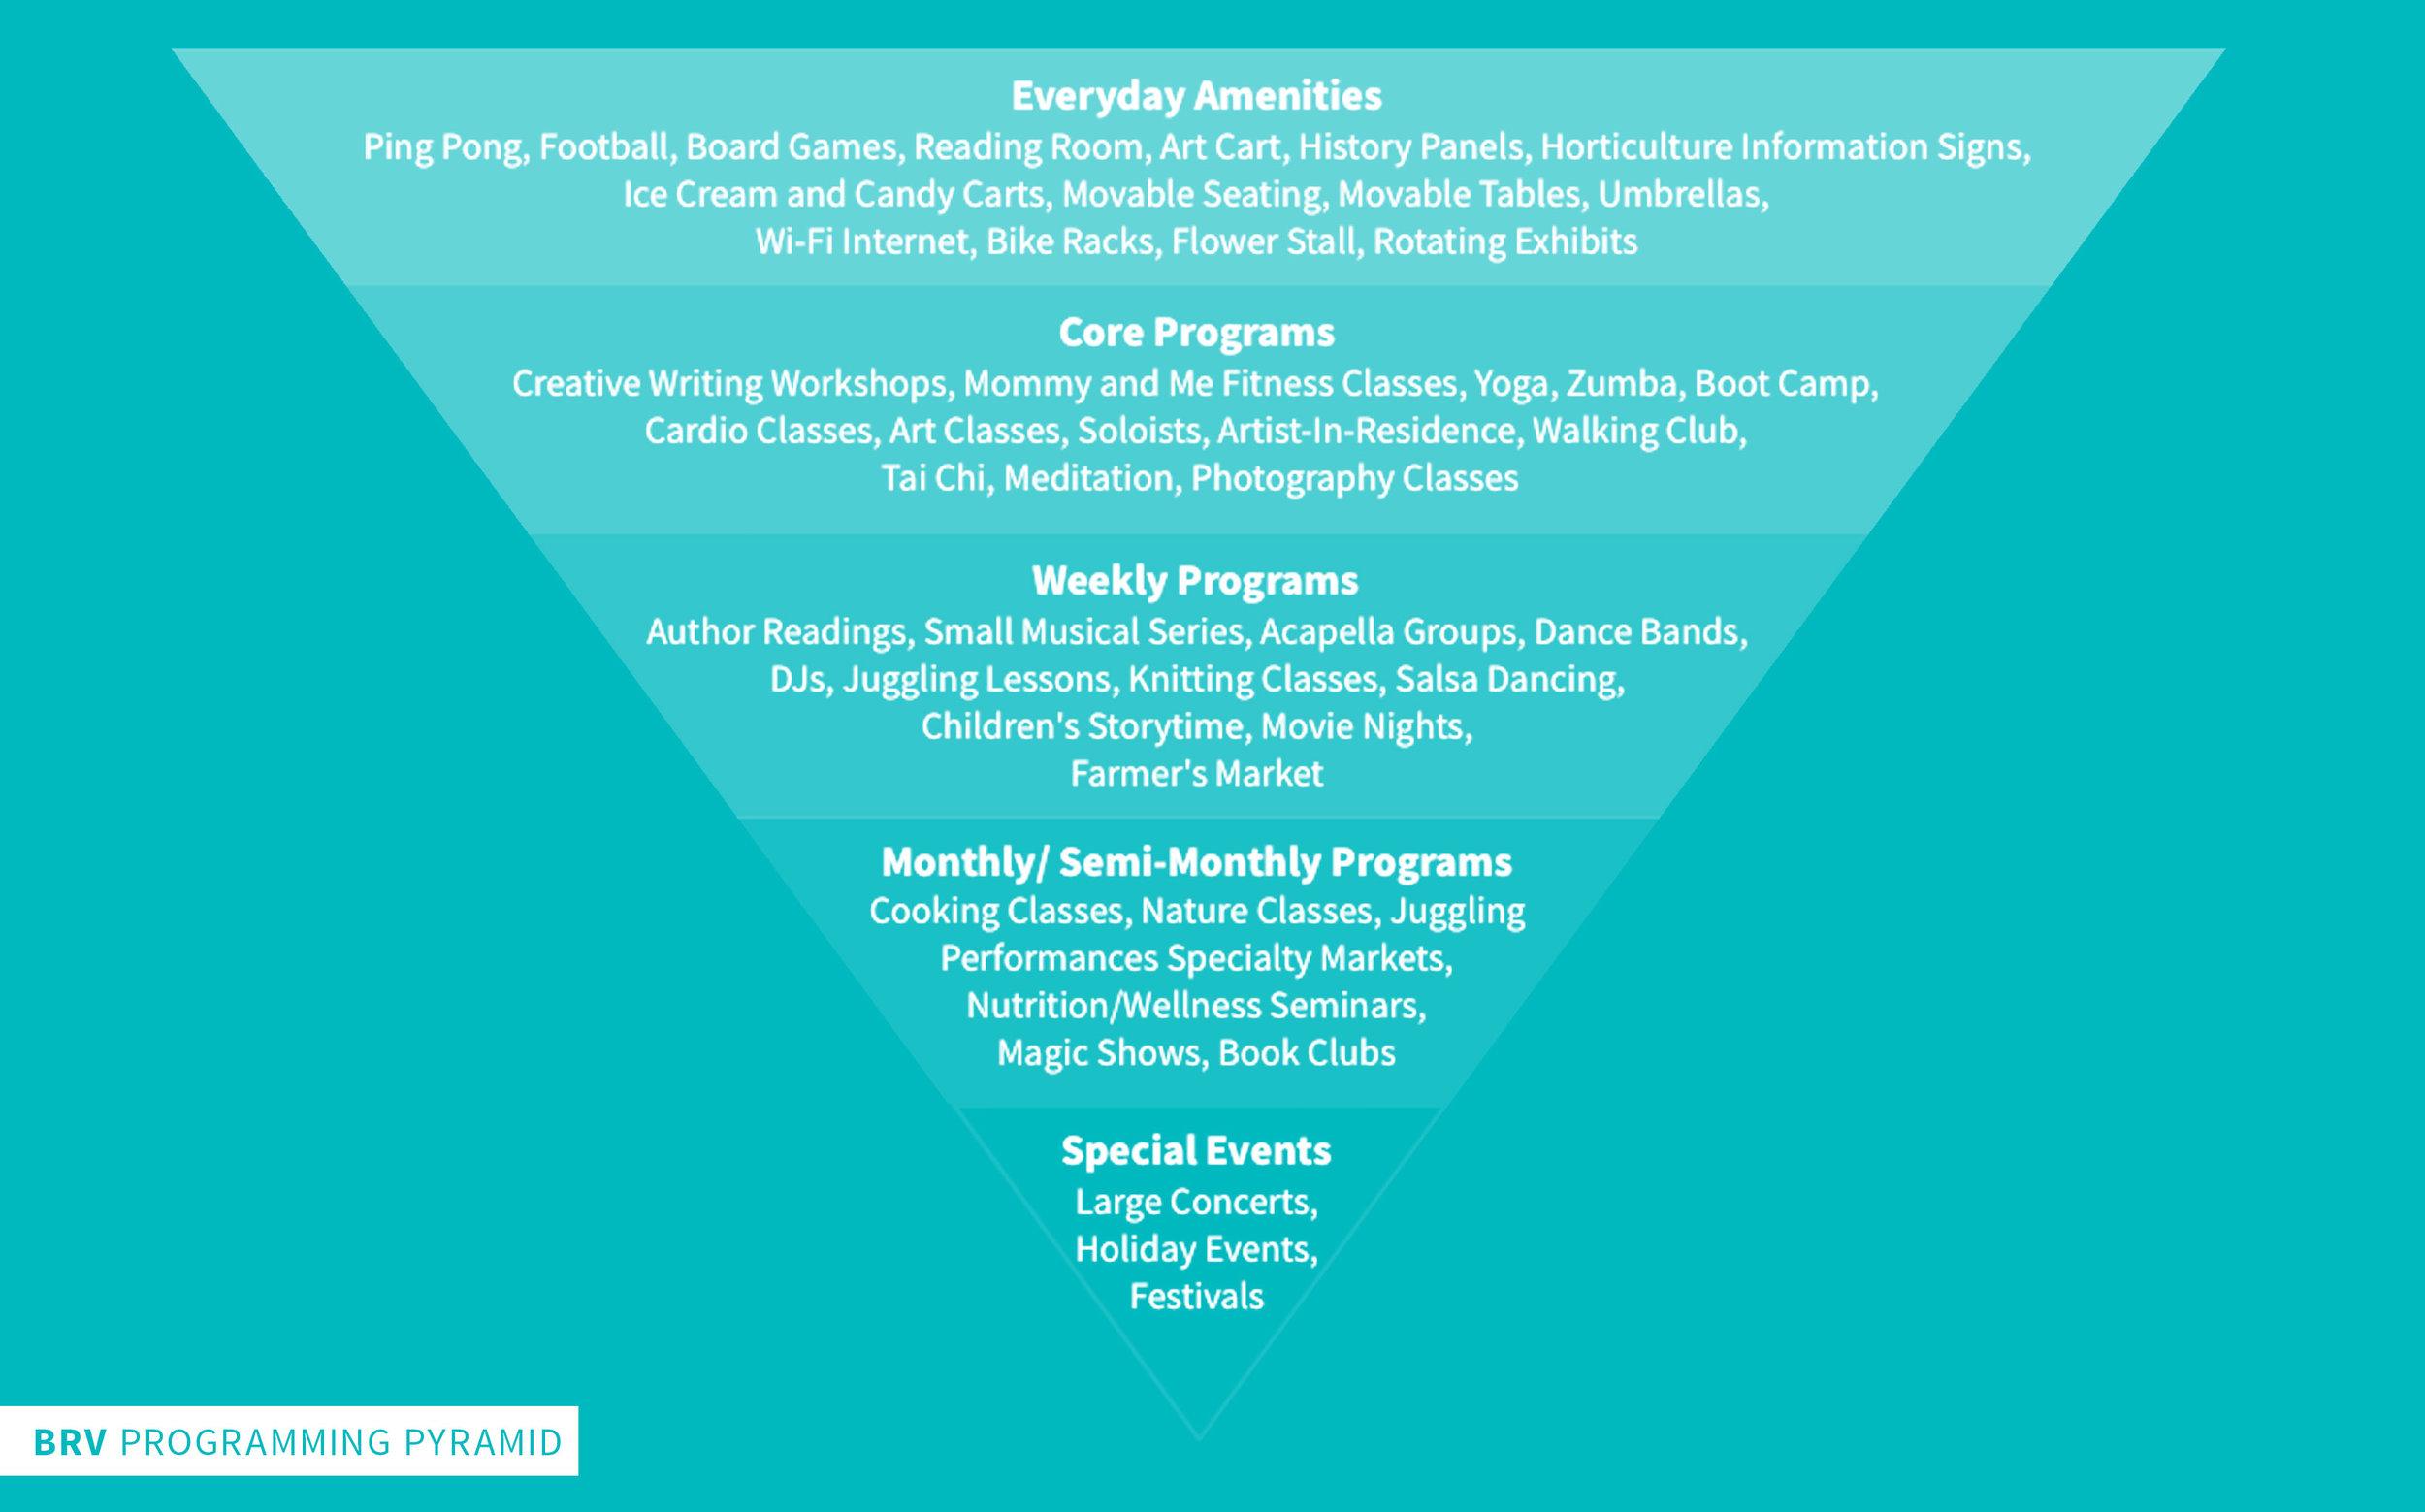 Programming pyramid.jpg